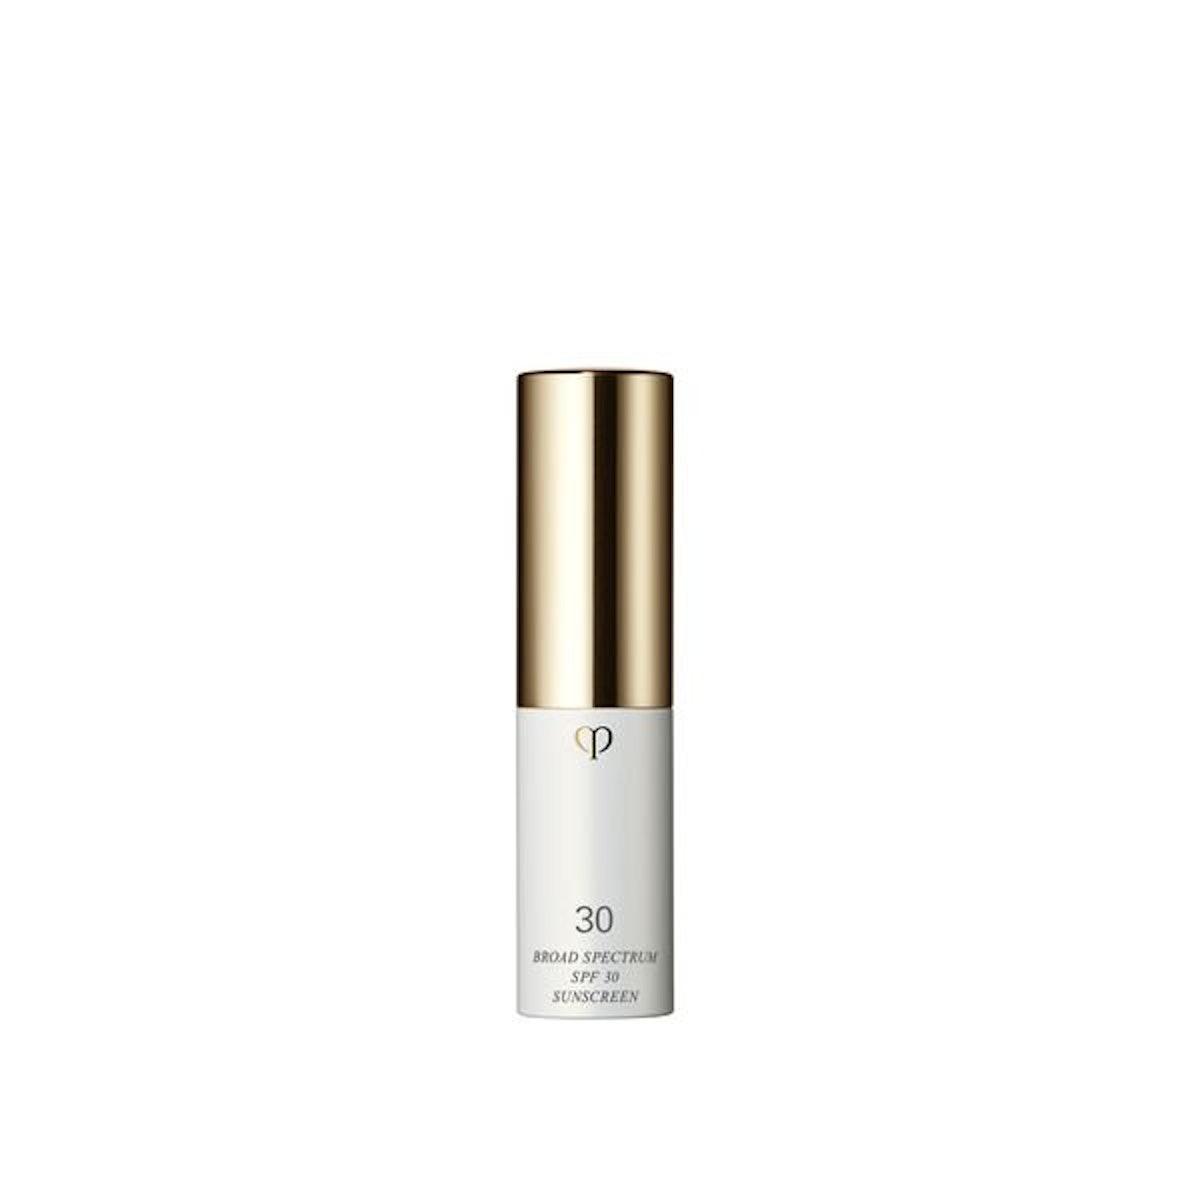 UV Protective Lip Treatment SPF 30